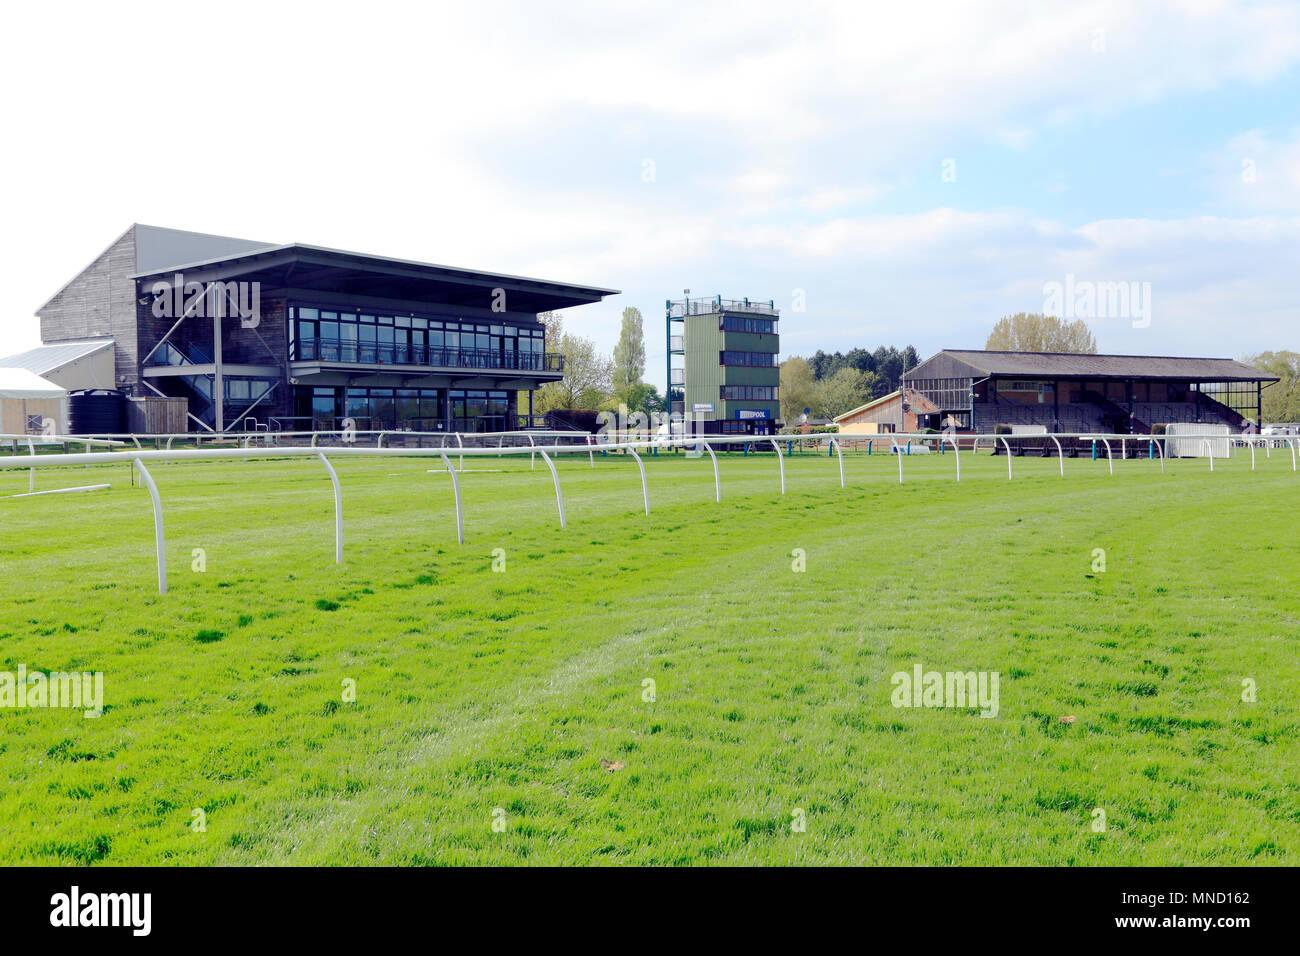 Fakenham Race Course, horse racing, track, tracks, main grandstand and Totepool, Norfolk, England, UK - Stock Image